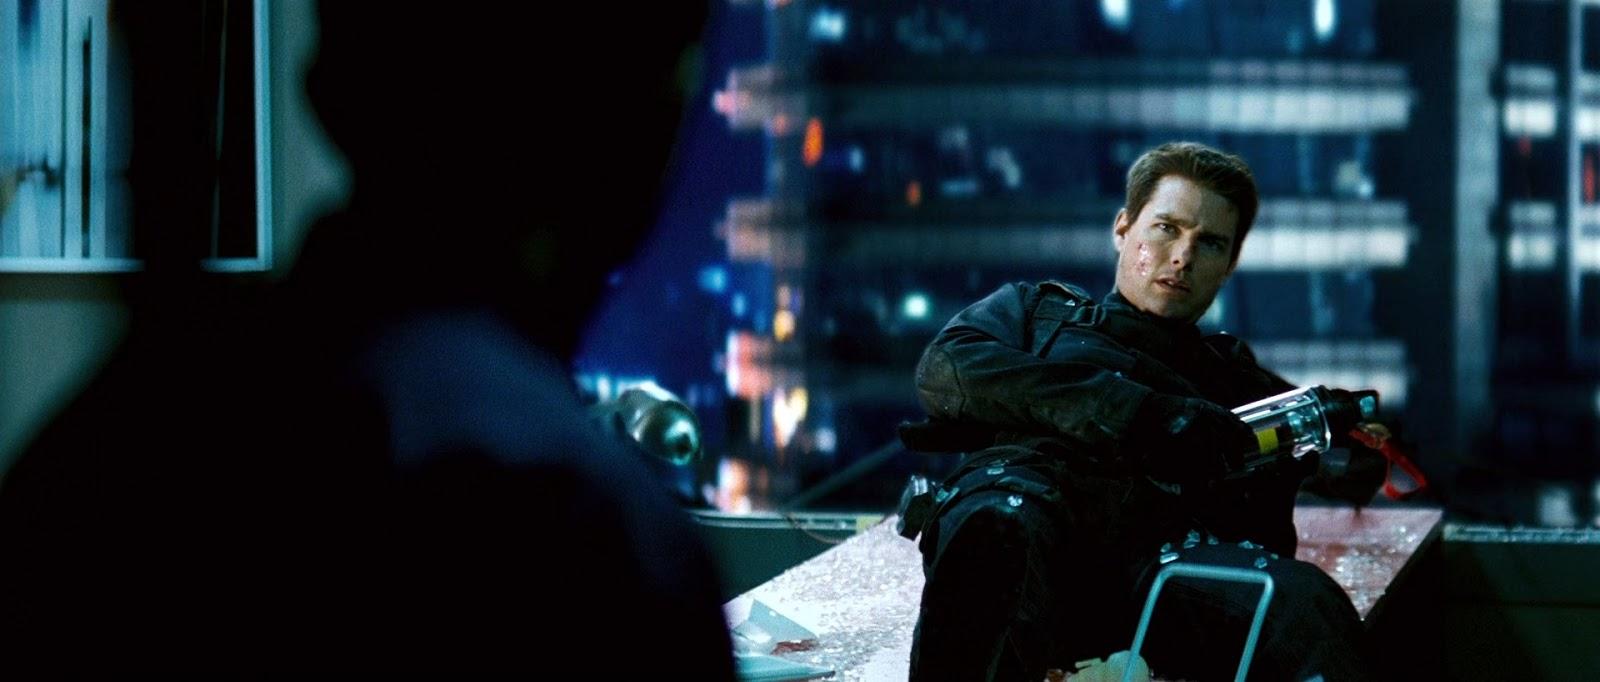 Mission Impossible III (2006 film) Dual Audio - Downloadmoja com